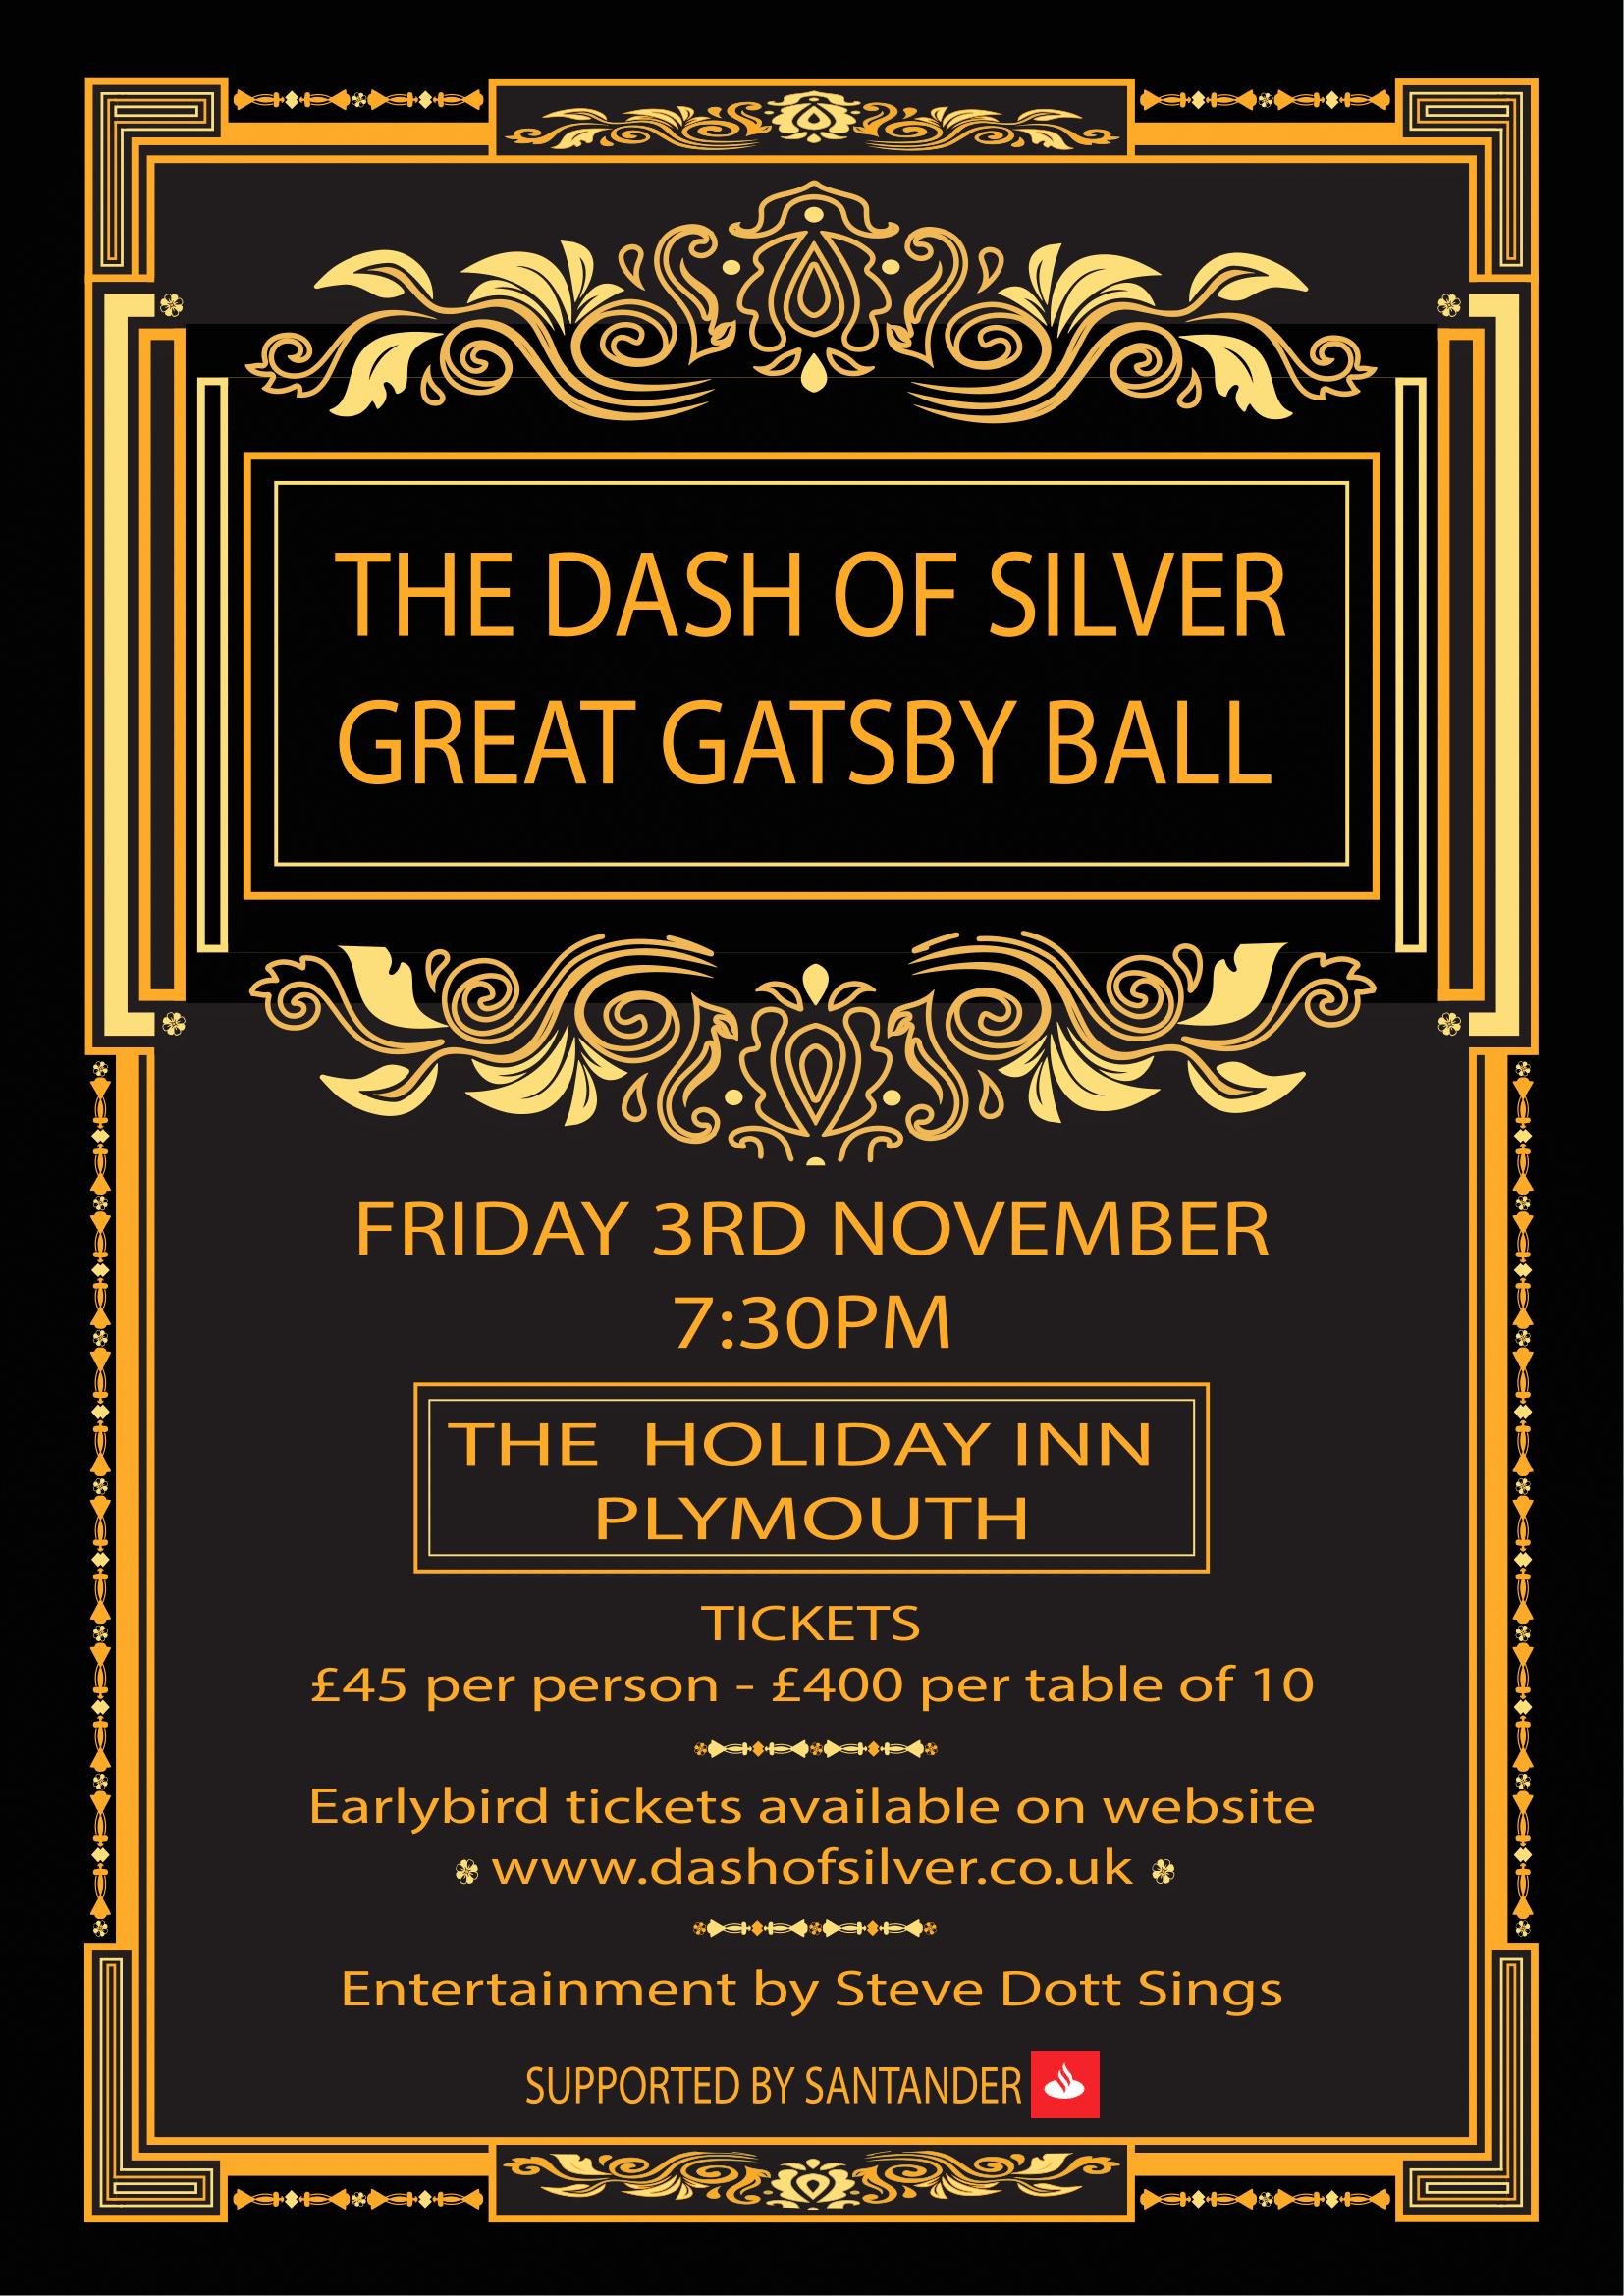 Great Gatsby Ticket Template Fresh Great Gatsby Ball Ticket